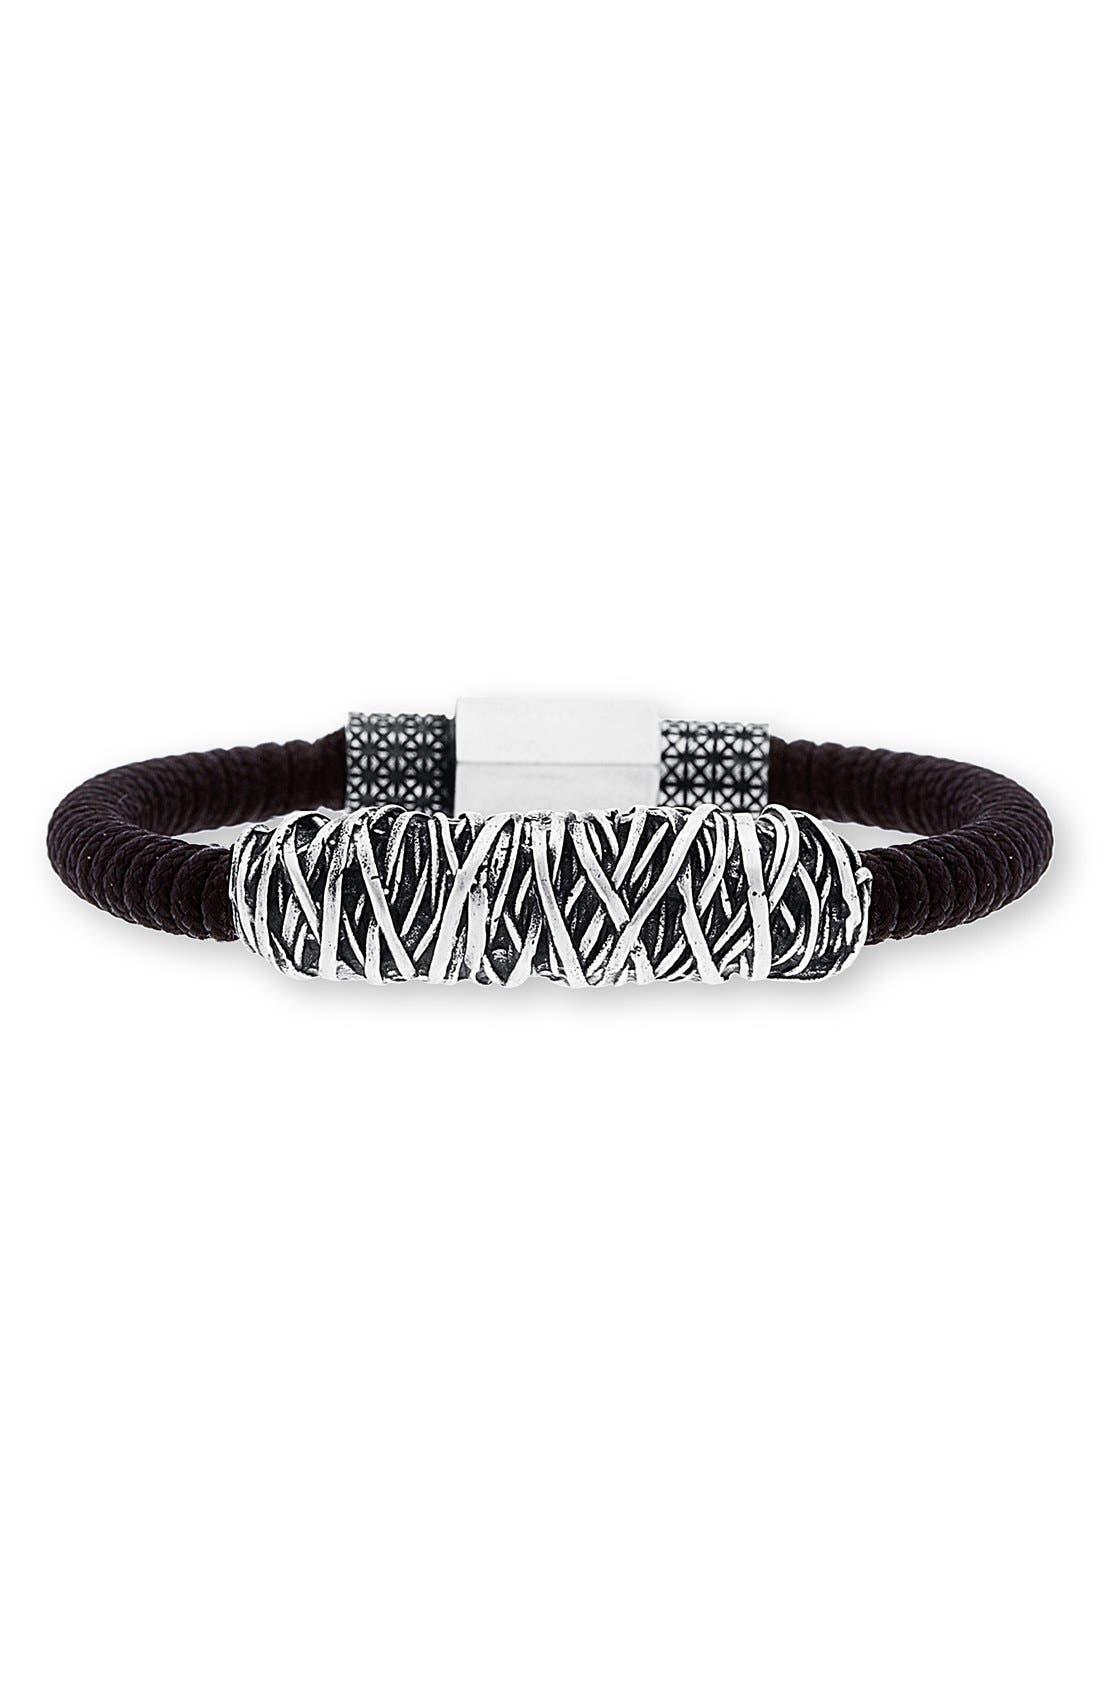 Main Image - Steve Madden Twisted Metal Cord Bracelet